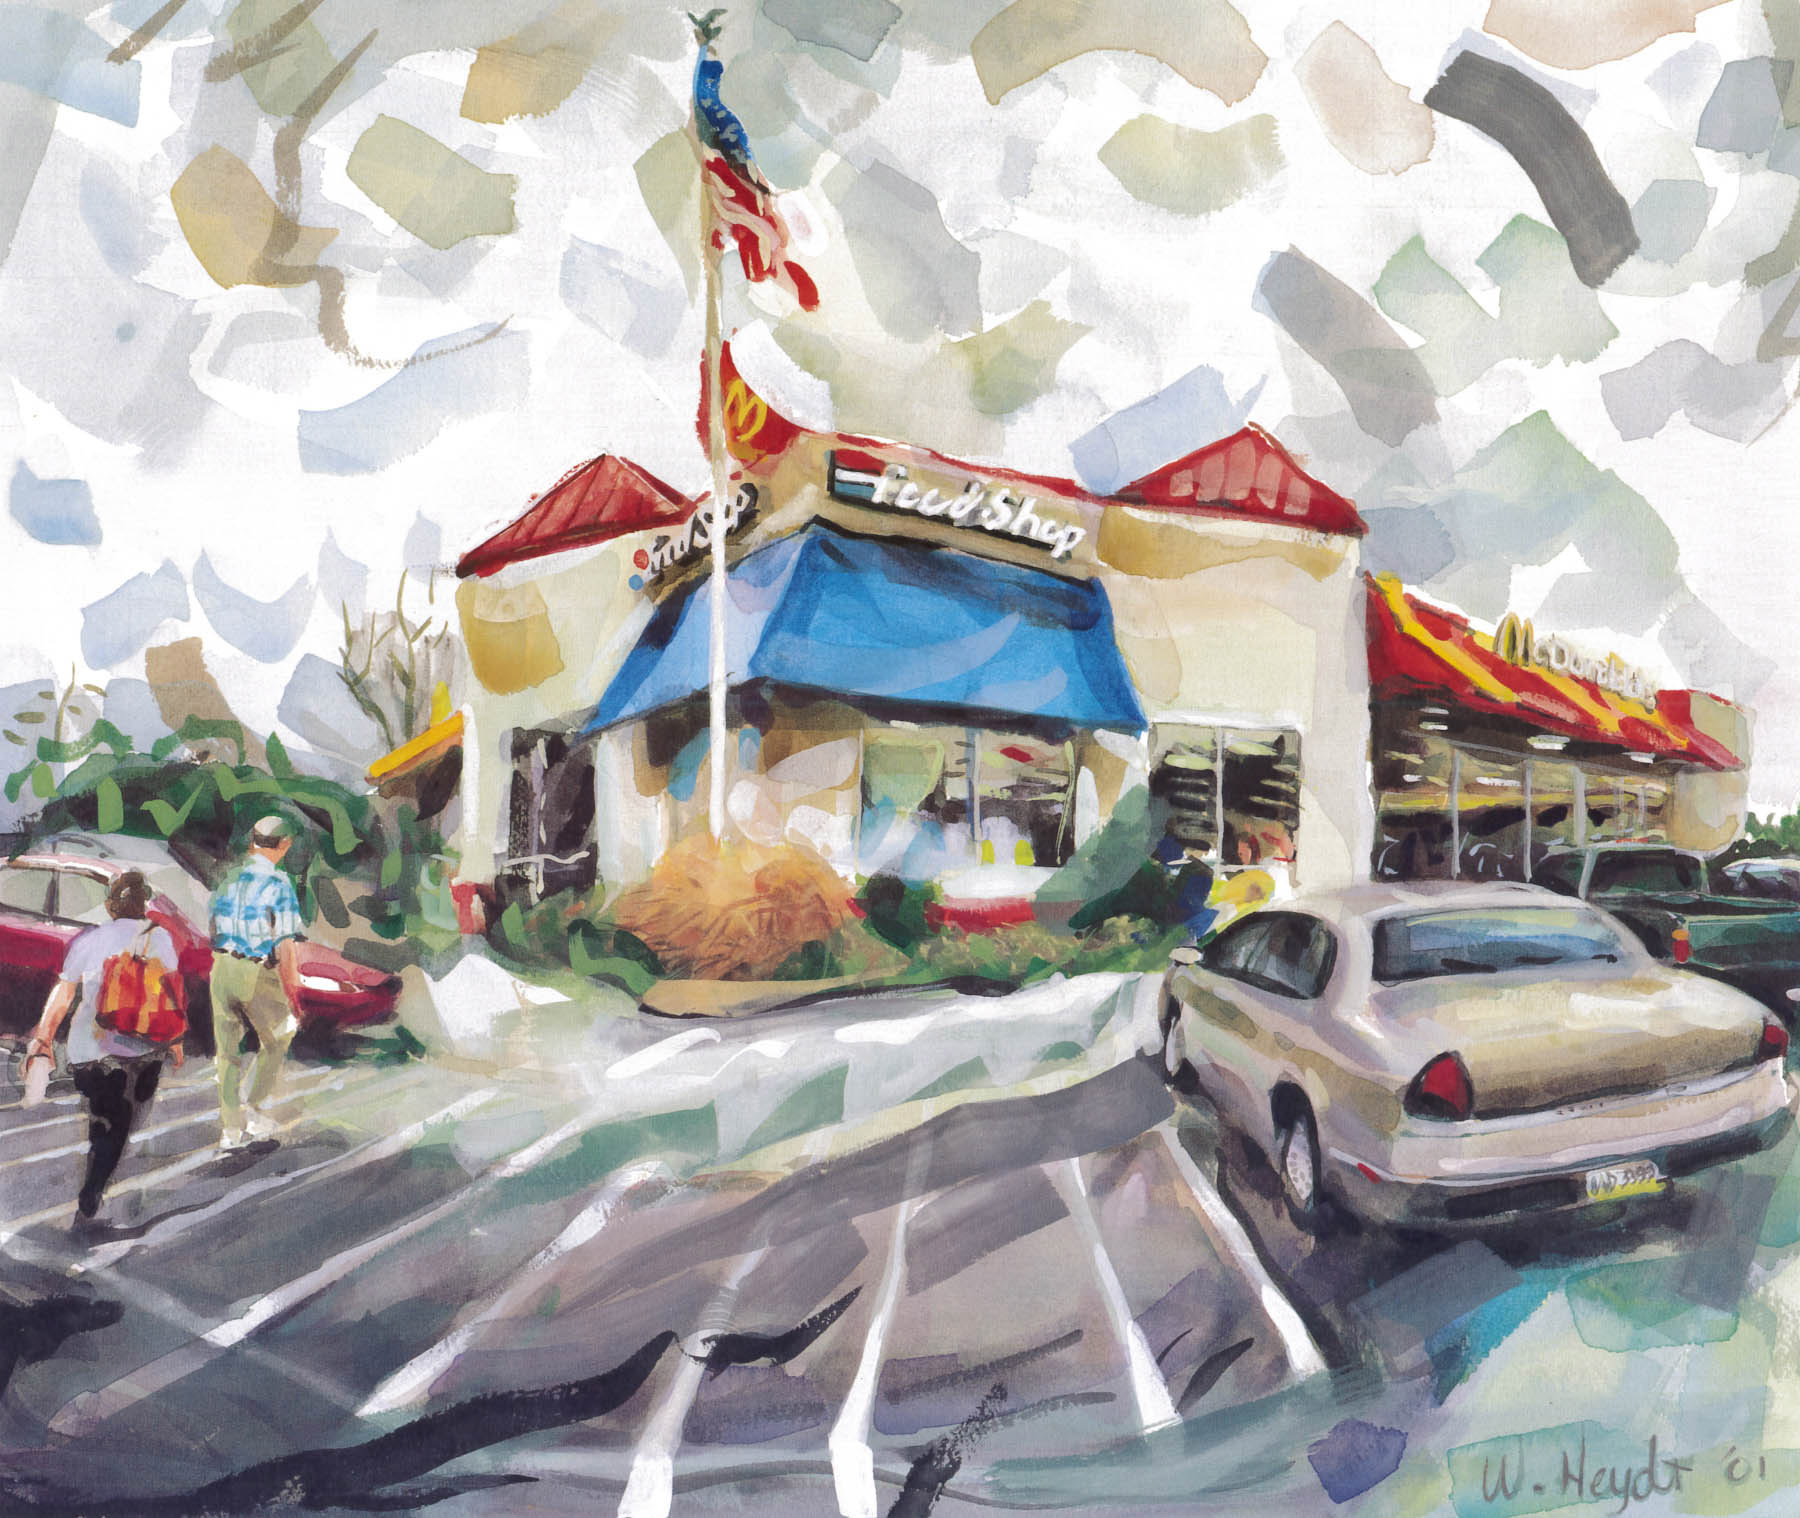 An-All-American-rest-stop-welcomes-motorists,-Rt-95,-North-Carolina.-21-x-50cm.jpg